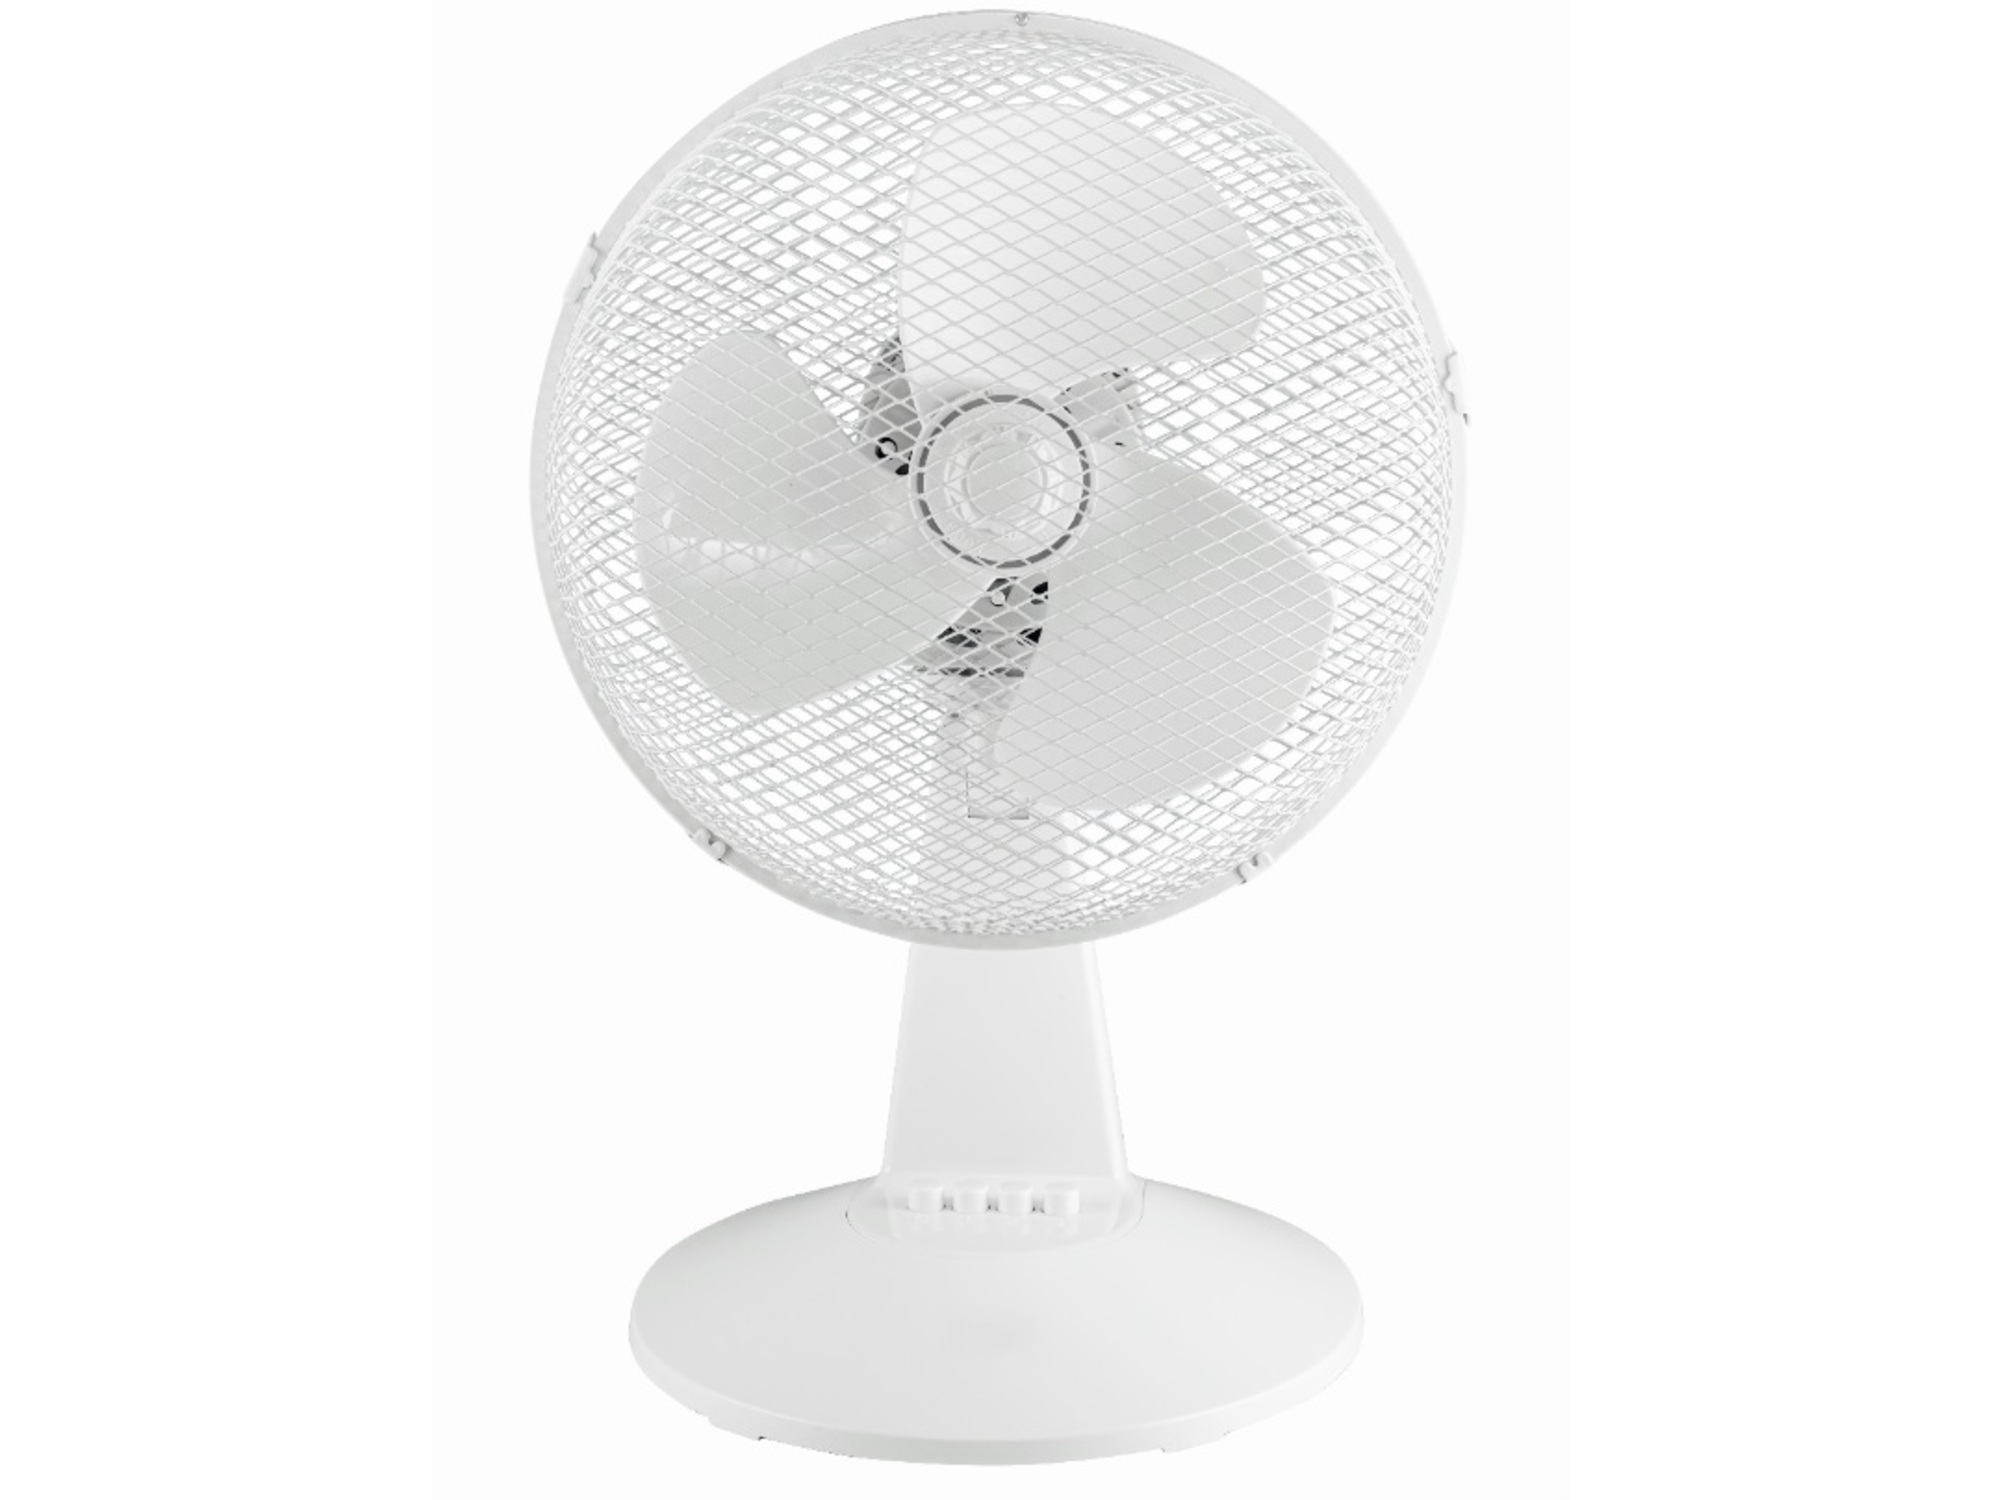 Midea Stoni ventilator 30cm FT30-21M